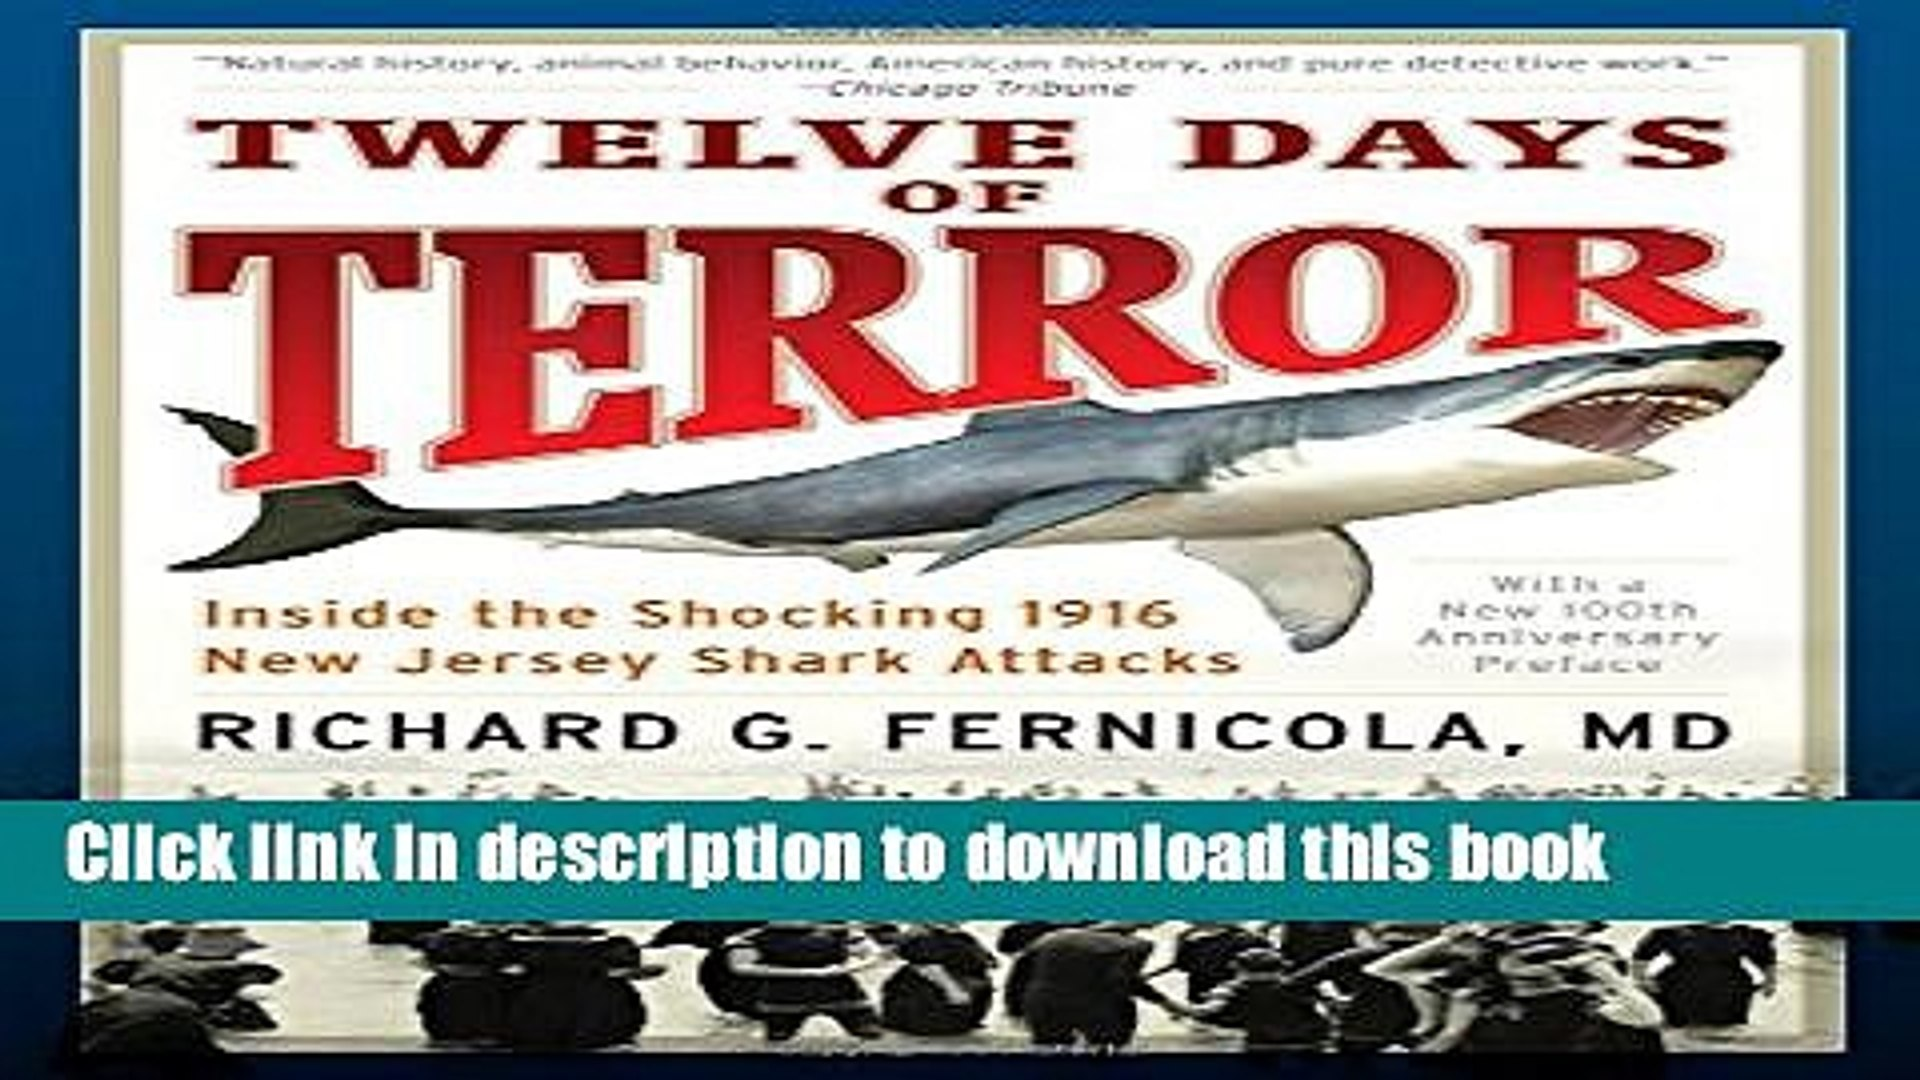 [PDF] Twelve Days of Terror: Inside the Shocking 1916 New Jersey Shark Attacks Download Full Ebook